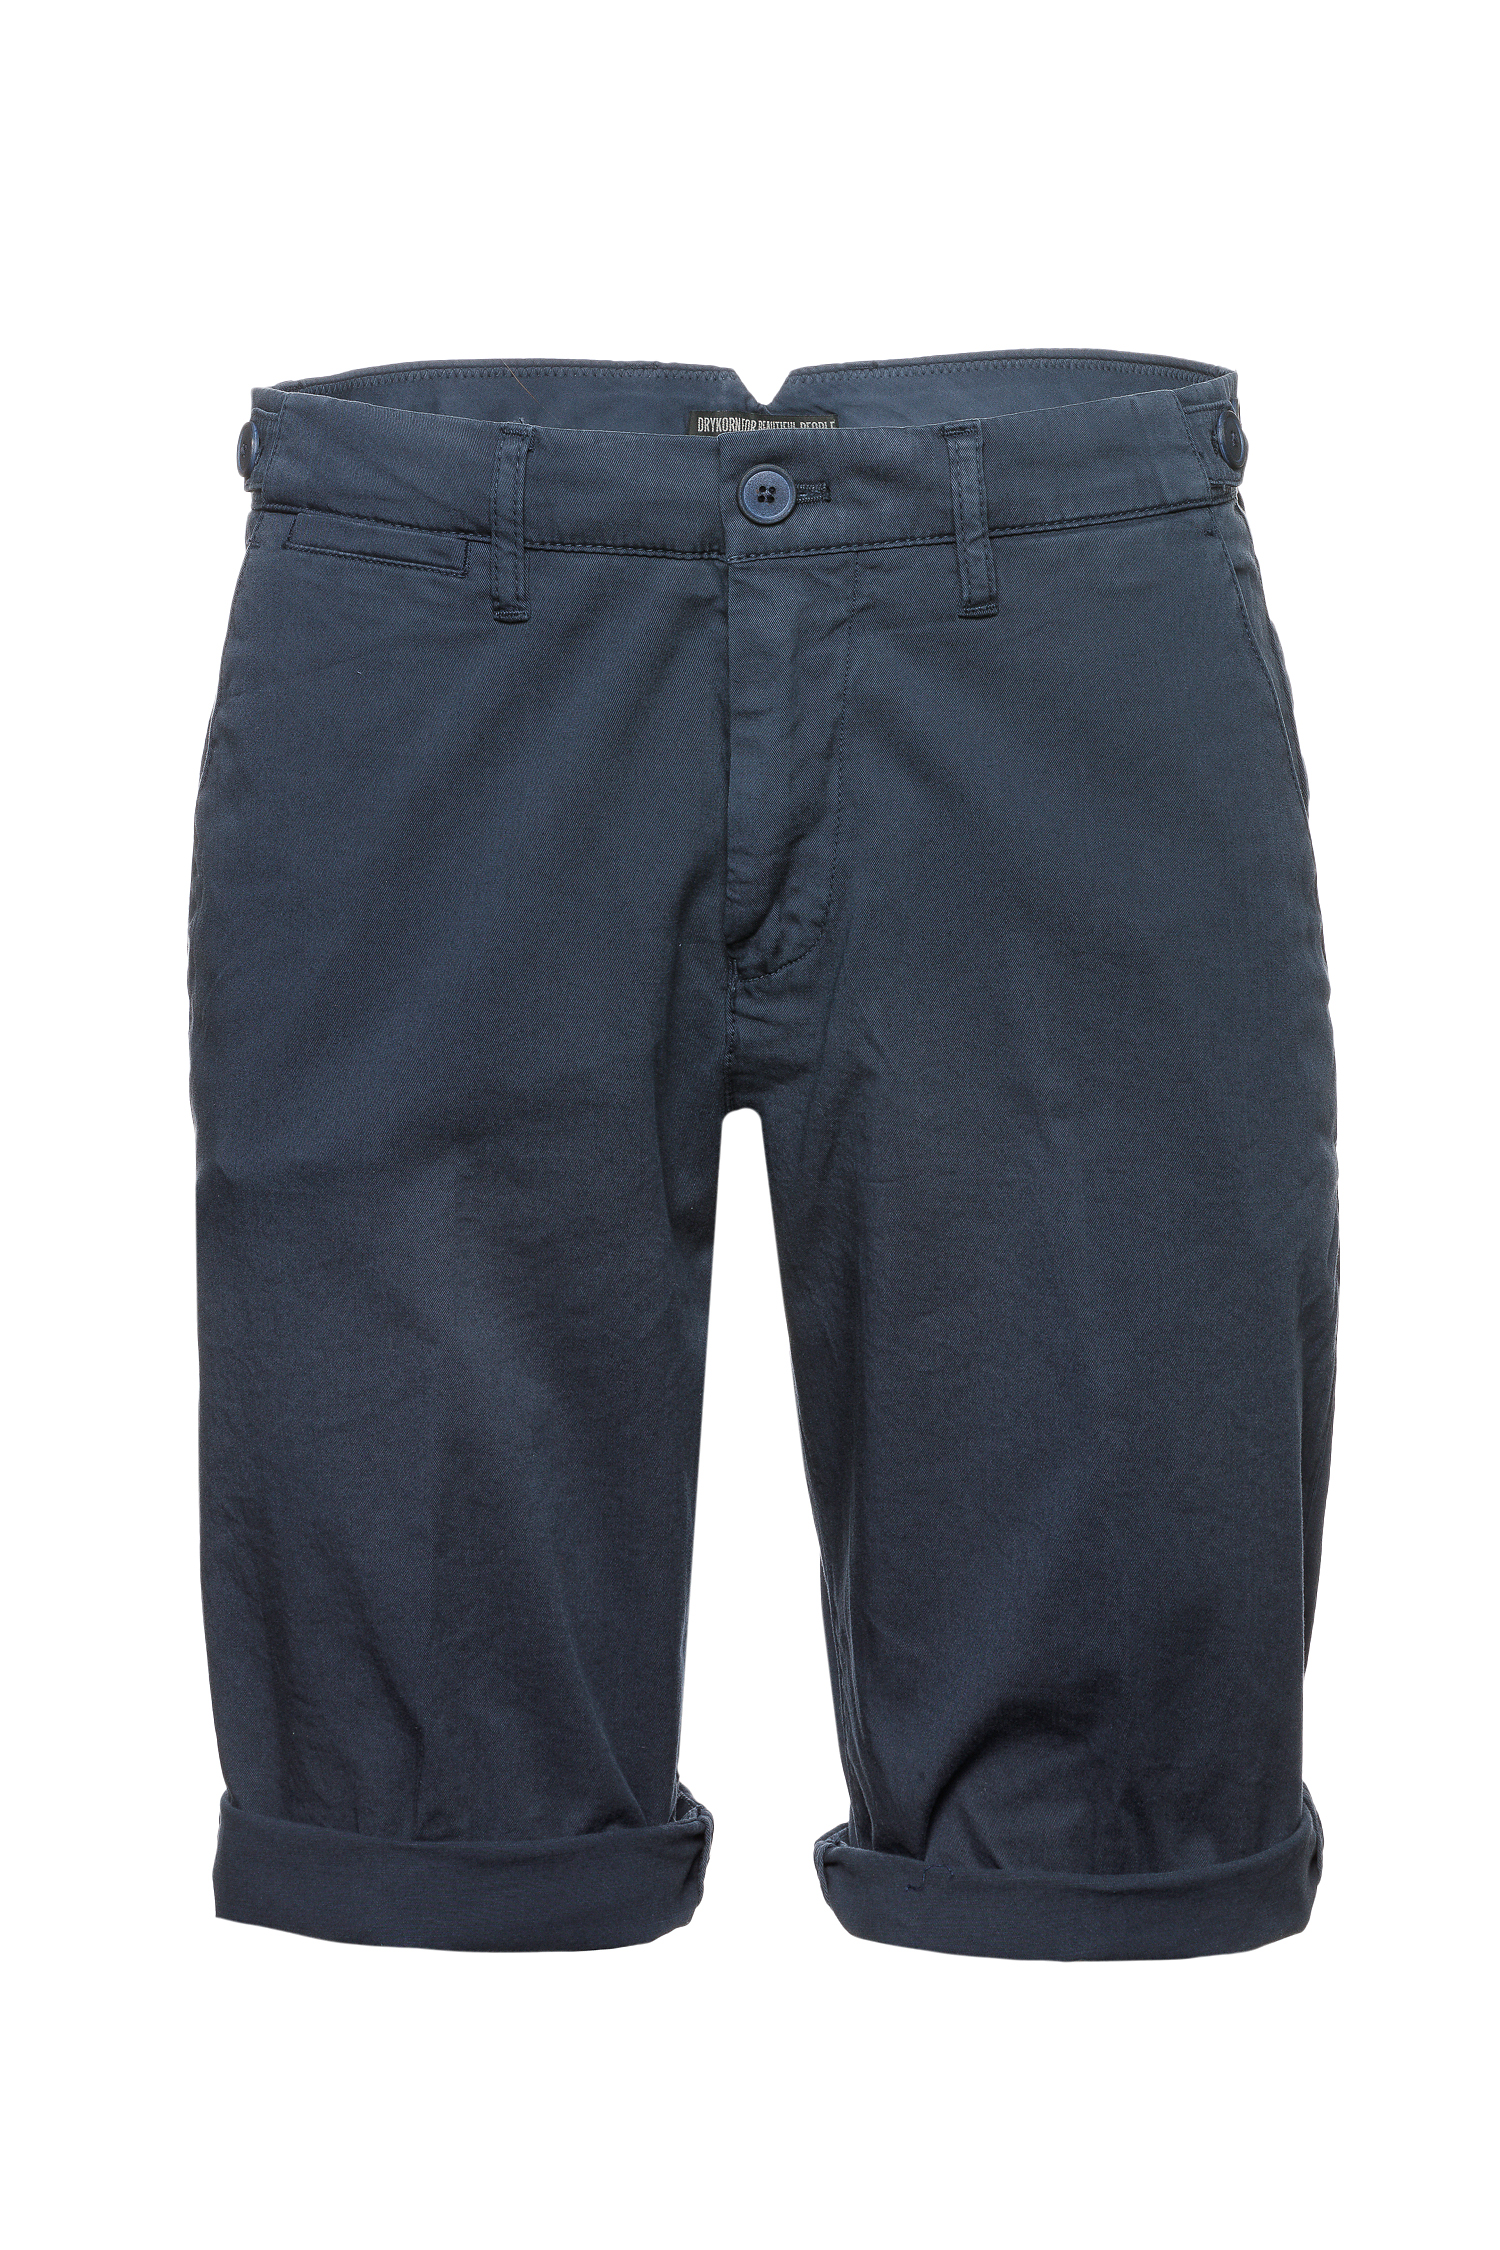 3396c92cd3cc Shorts Krink